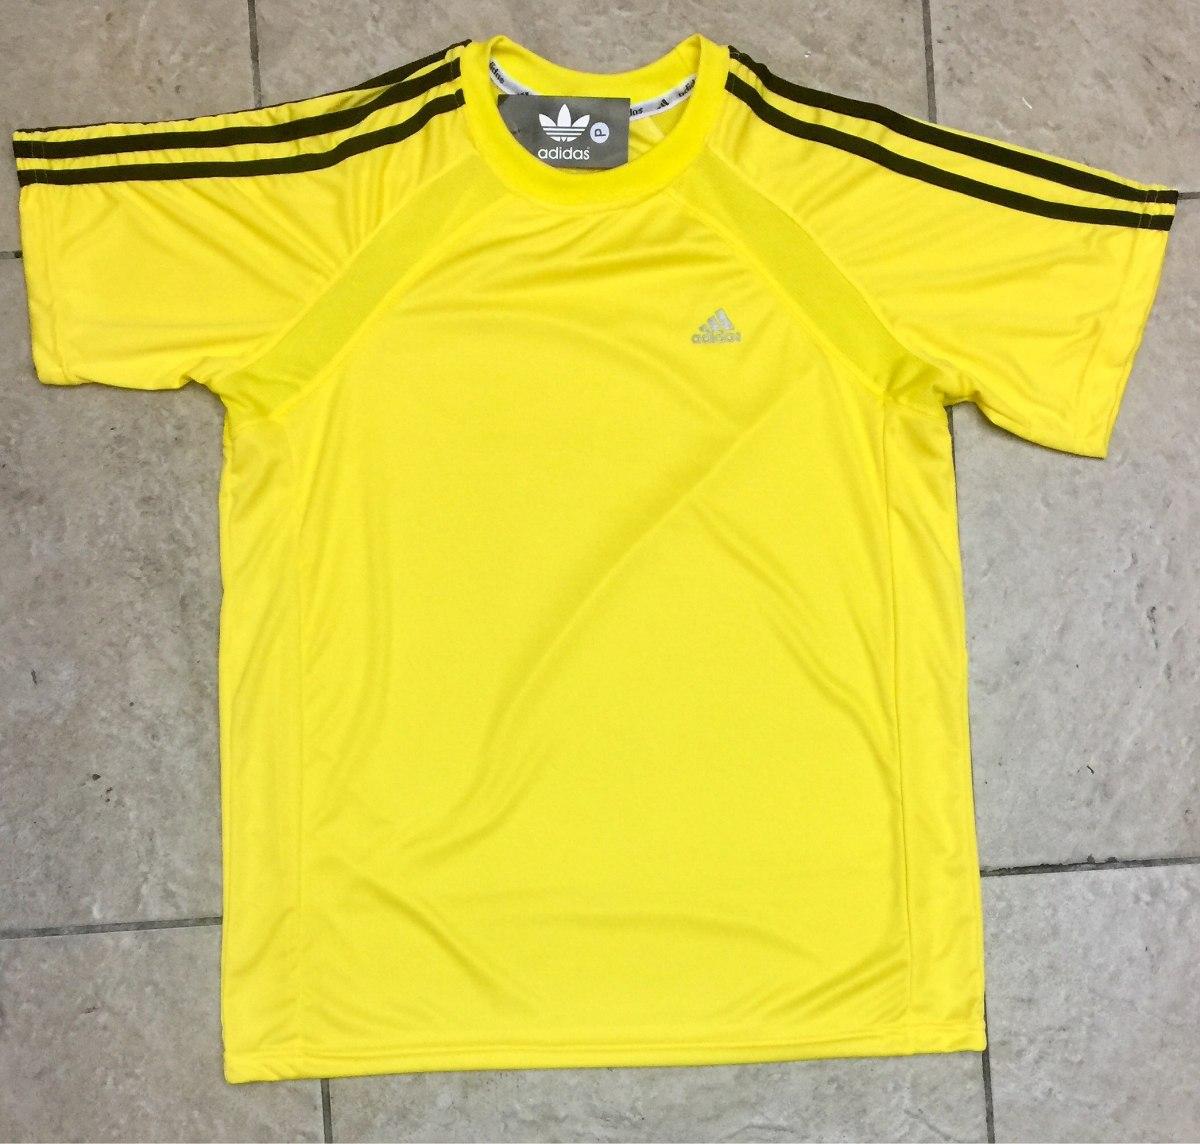 atacado kit c 10 camiseta camisa nike esporte dry-fit. Carregando zoom. cb4ec0f649ca0